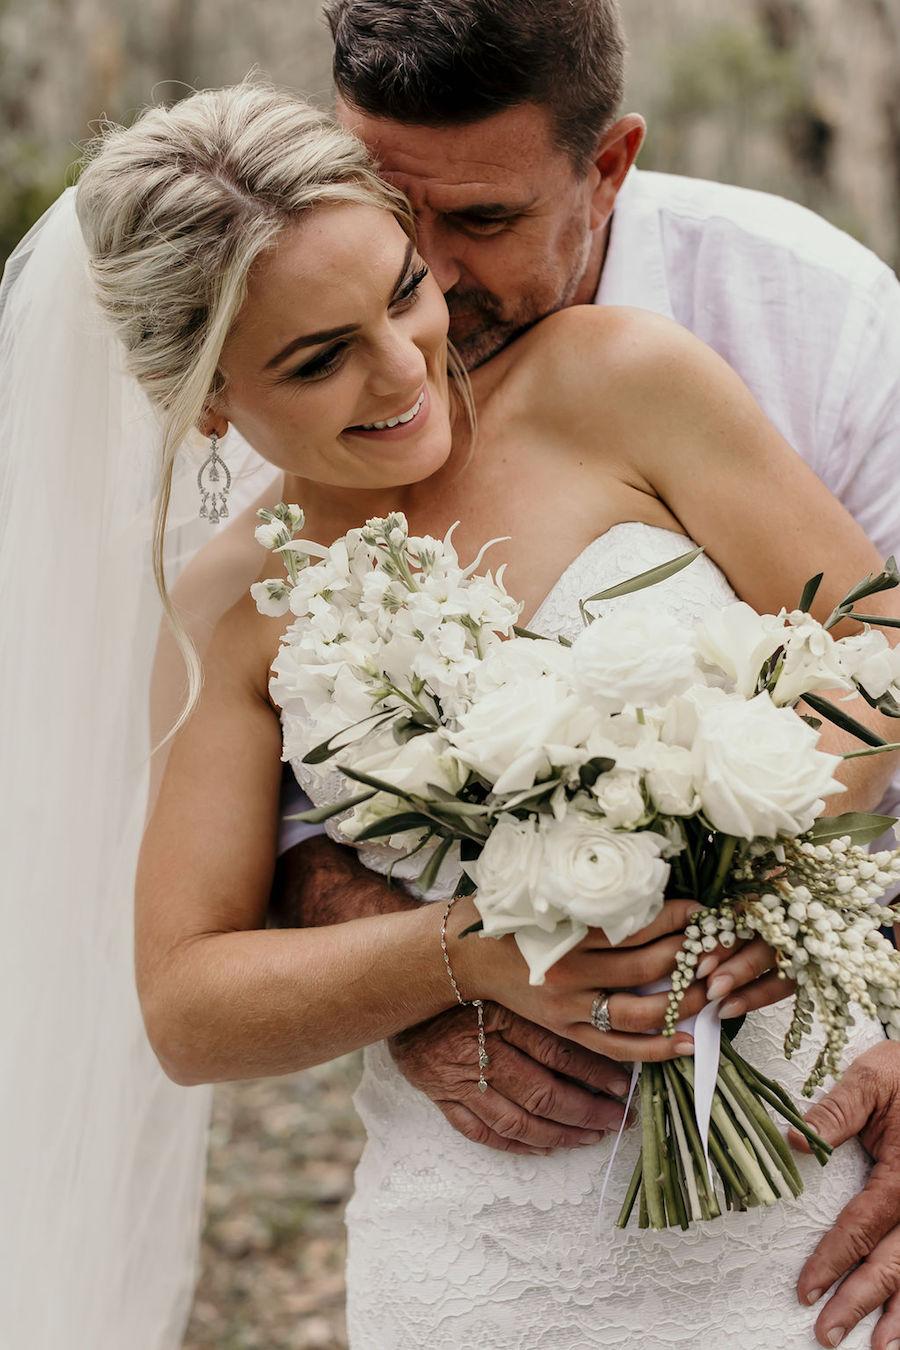 tweed-coast-weddings-wedding-venue-osteria-casuarina-ceremony-reception-5D3A7071.jpg